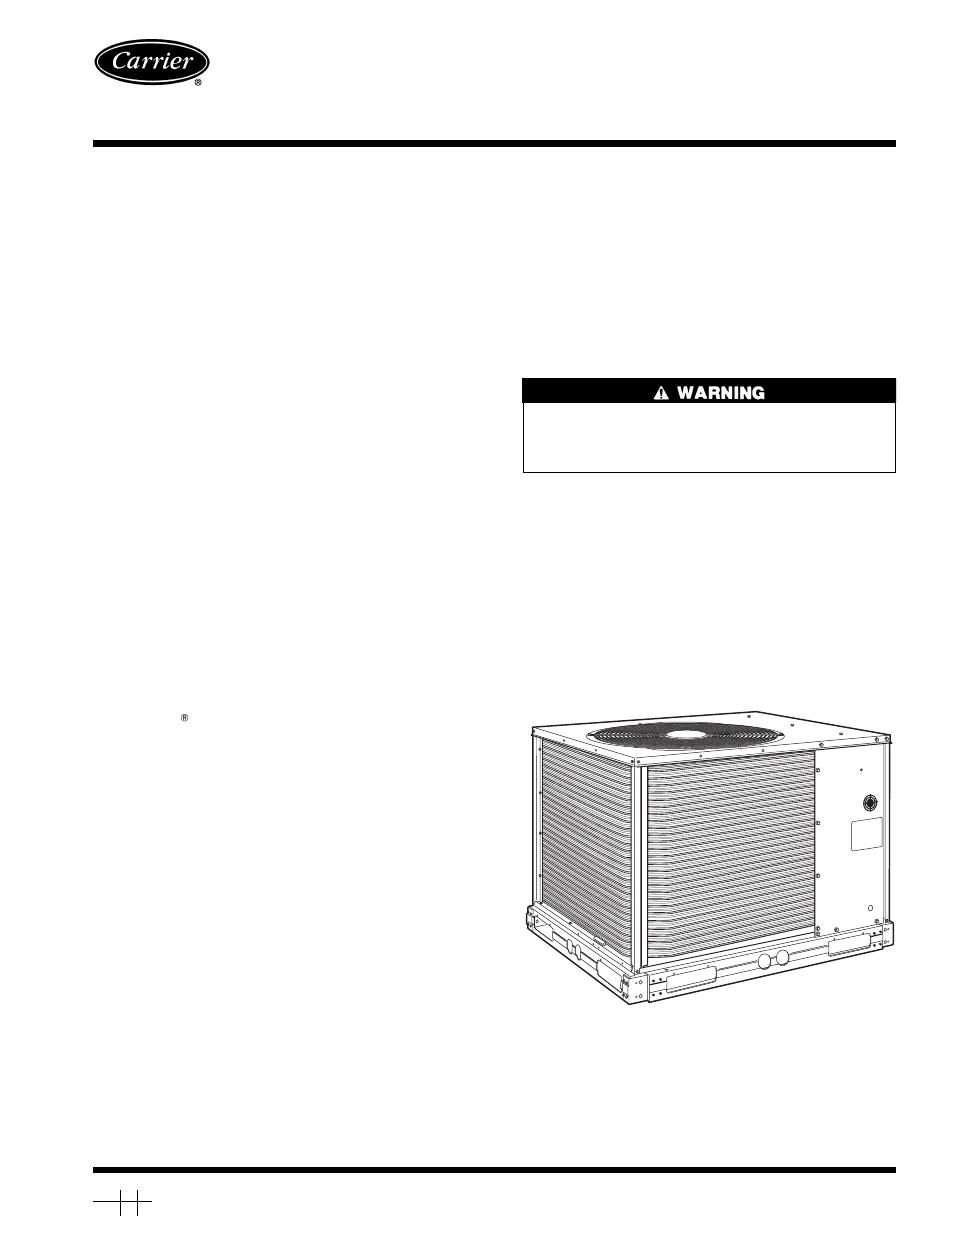 Carrier 38ak012 User Manual